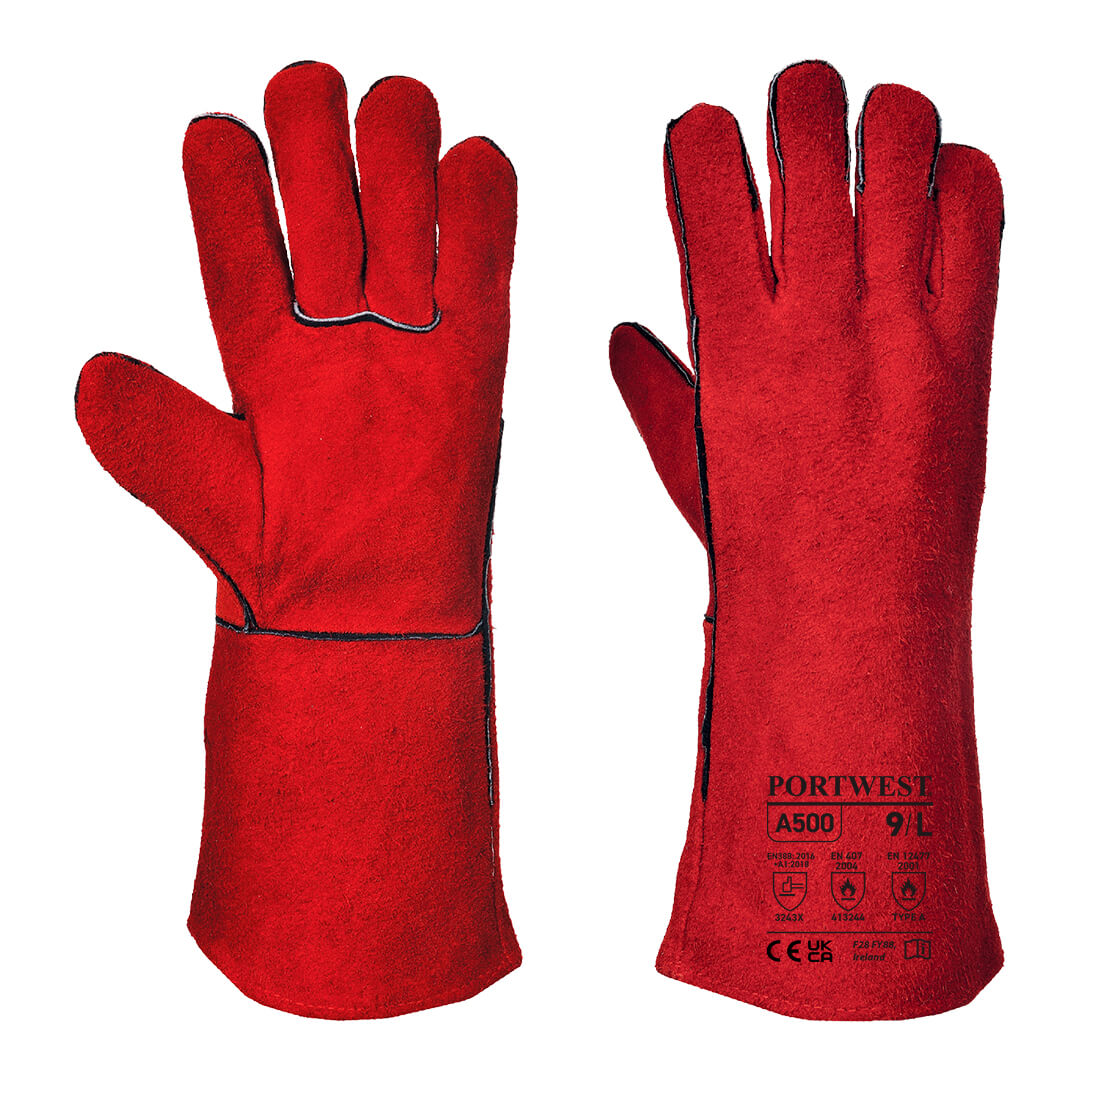 Welders Gauntlet, Red        Size XL R/Fit